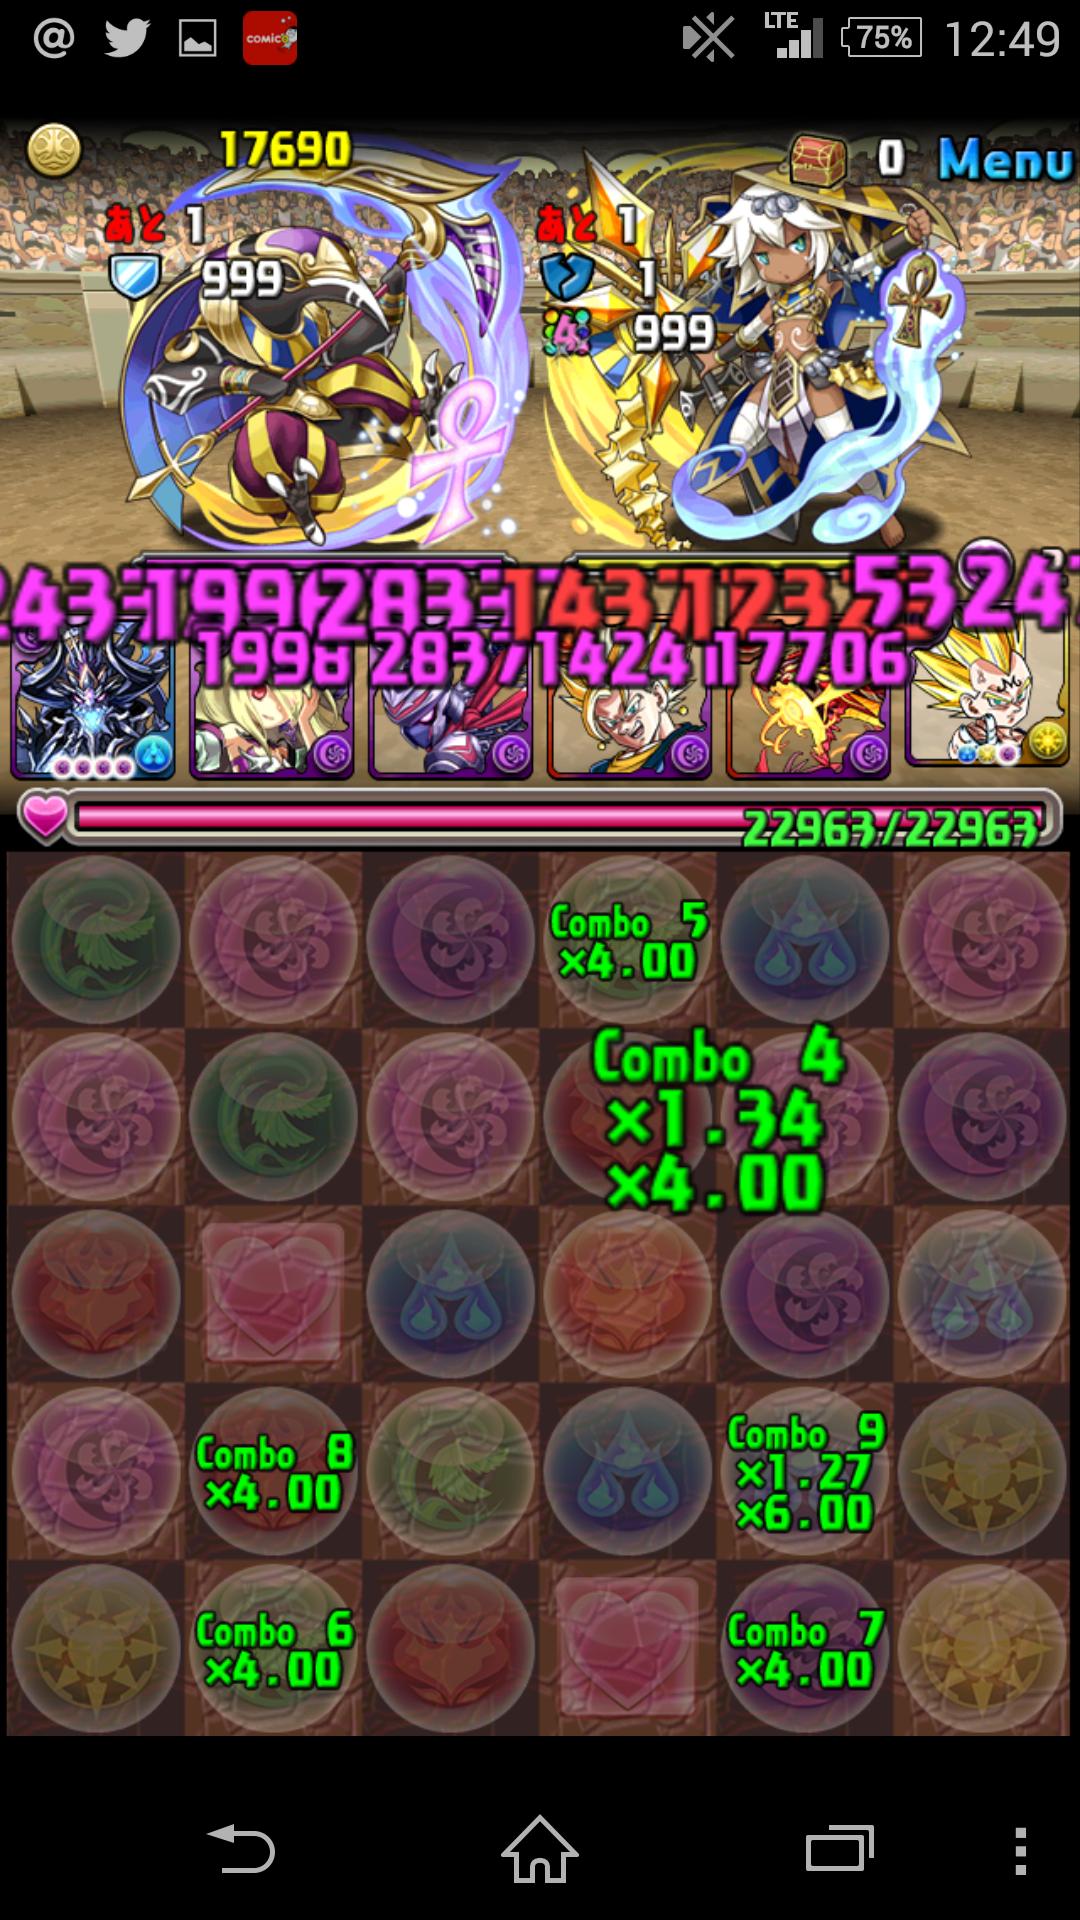 Screenshot_2015-06-19-12-49-03.png